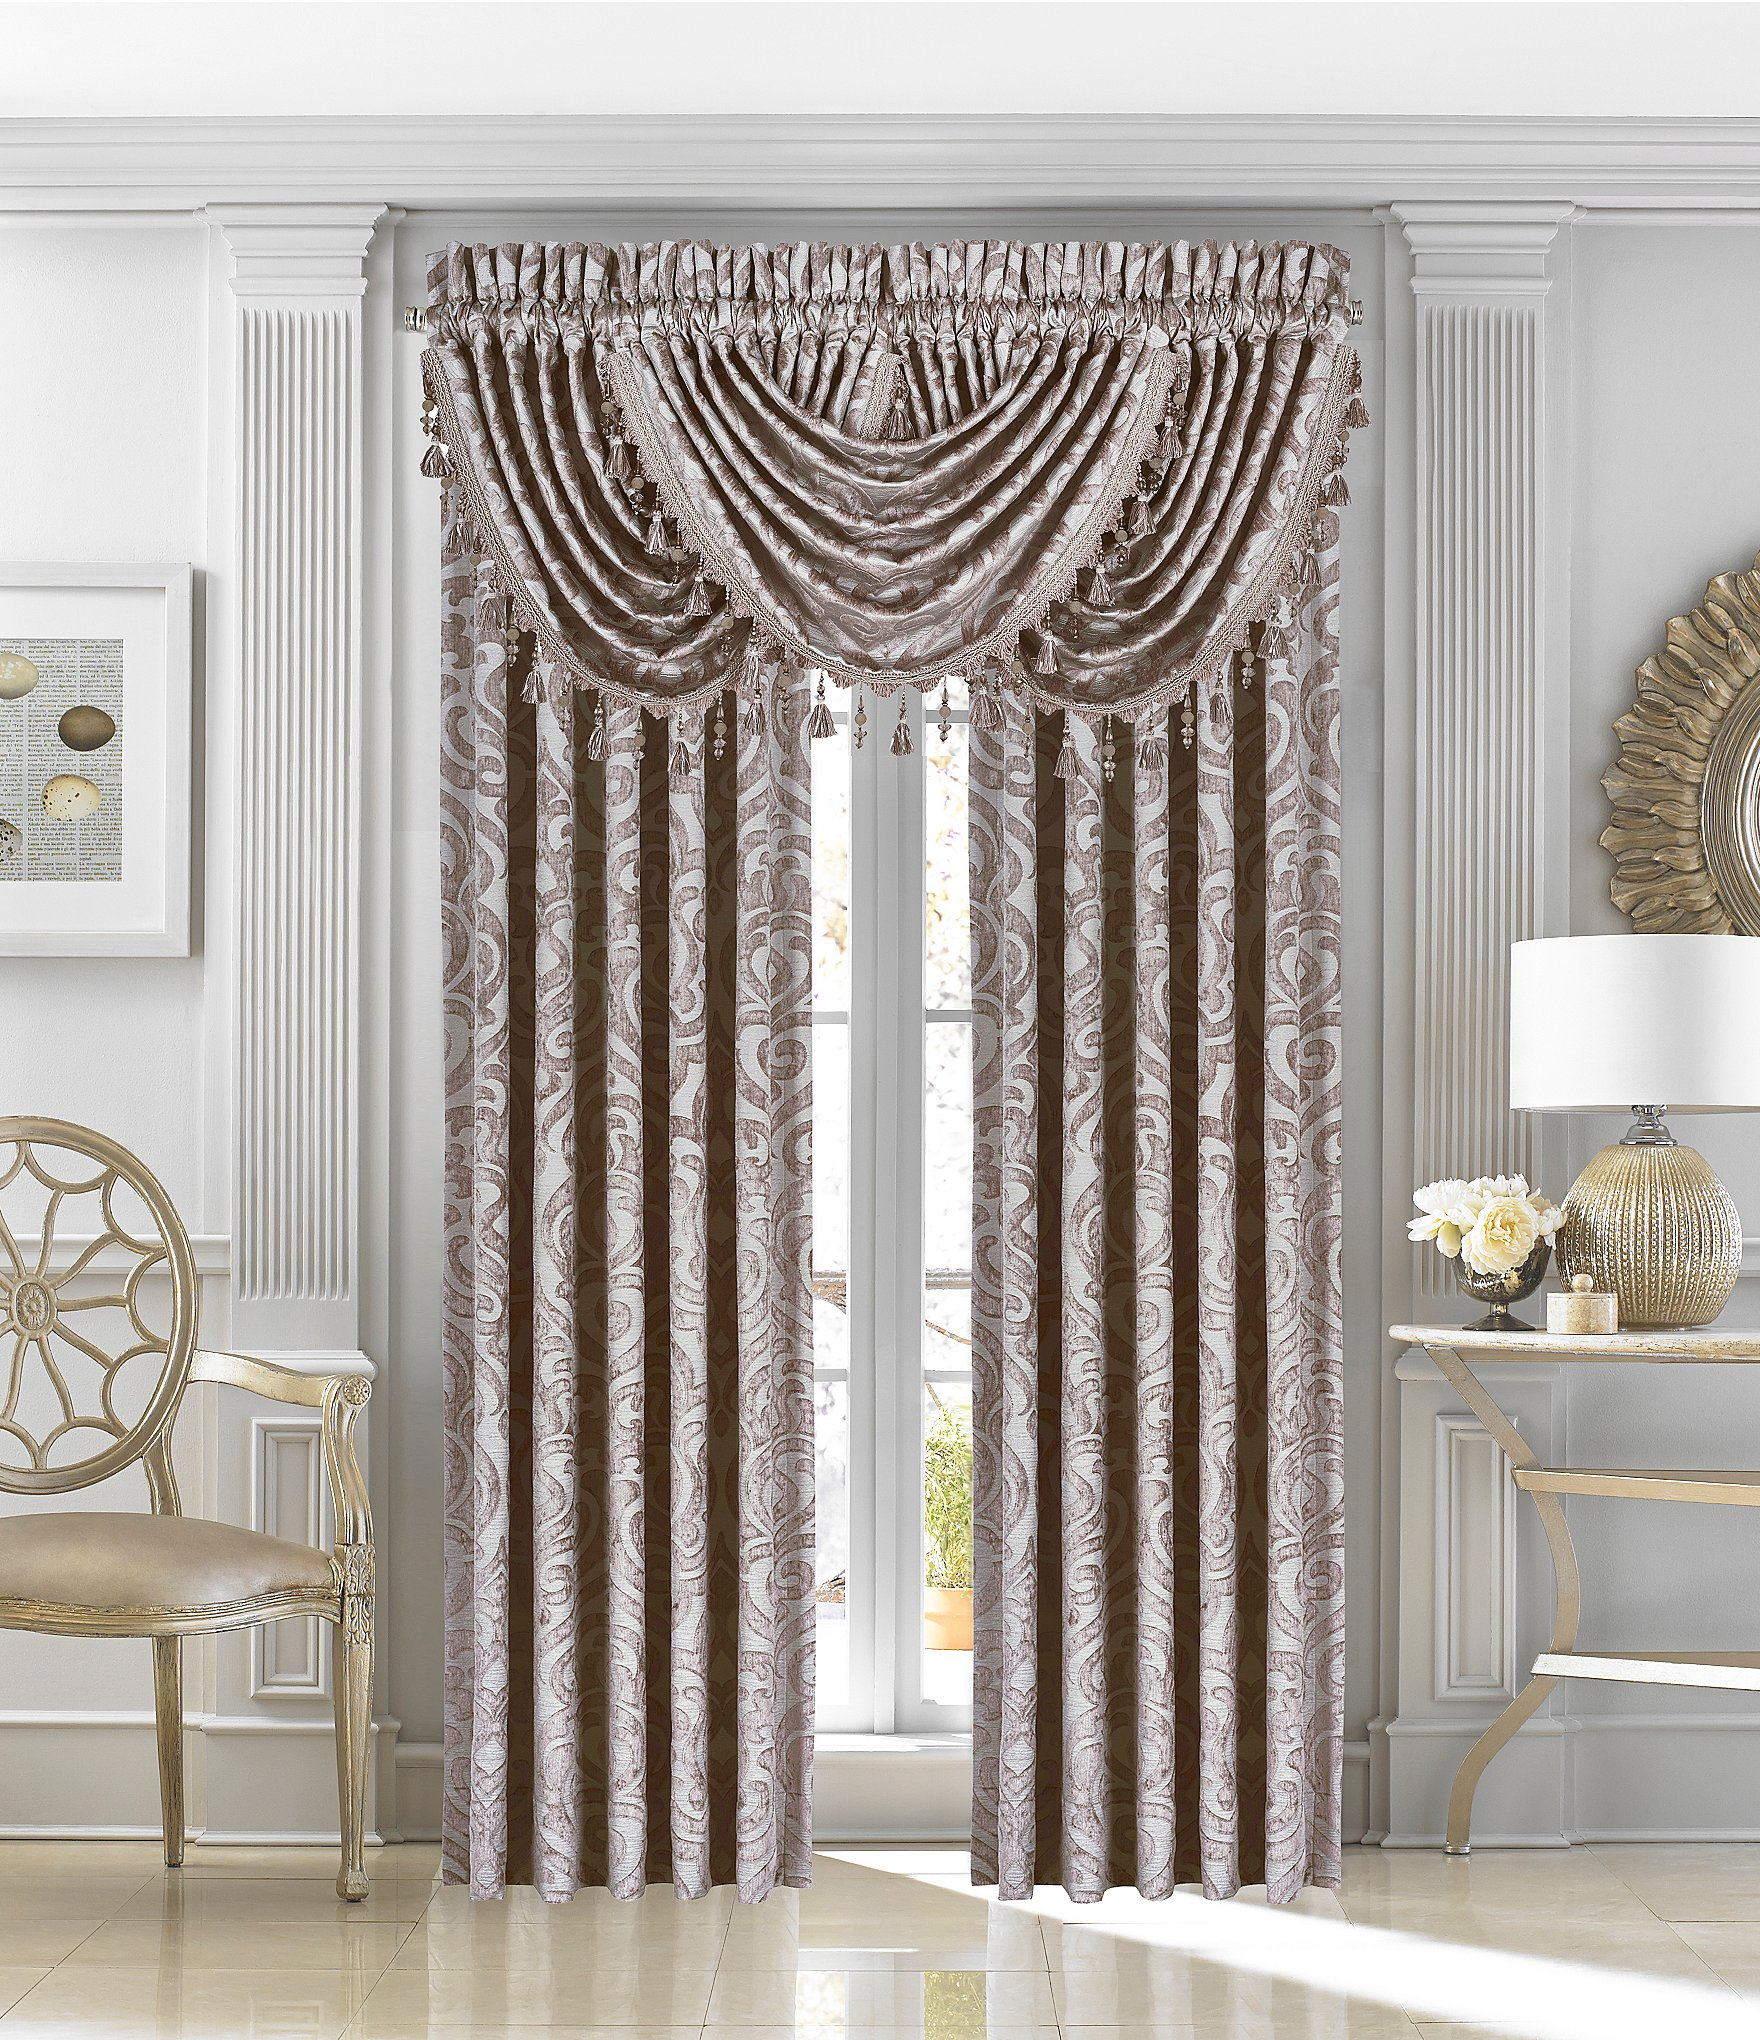 J queen new york sicily damask window treatments dillards Latest window treatments